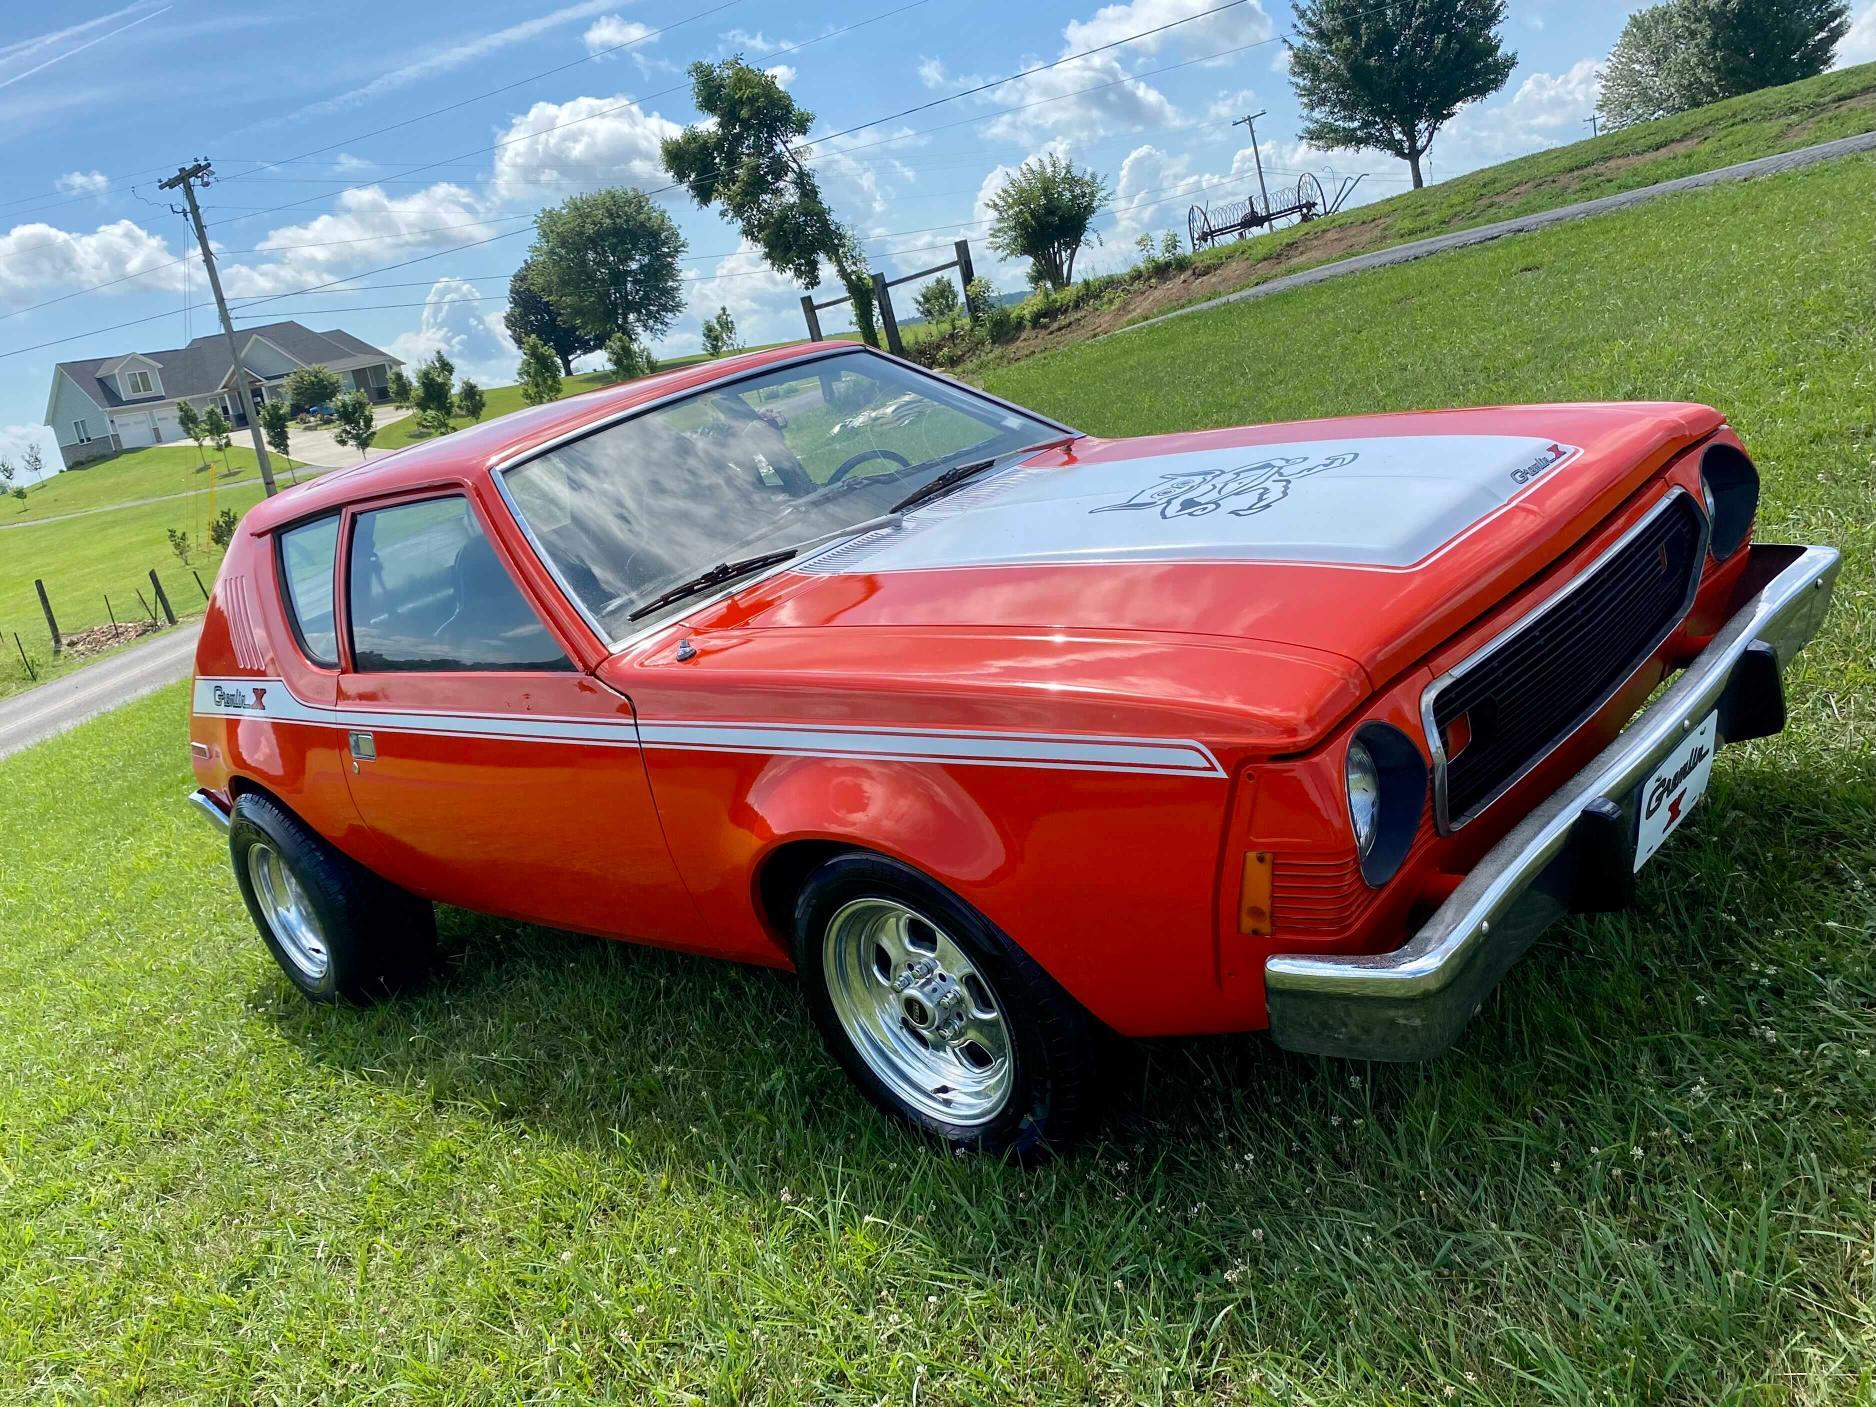 American Motors salvage cars for sale: 1974 American Motors Gremlin